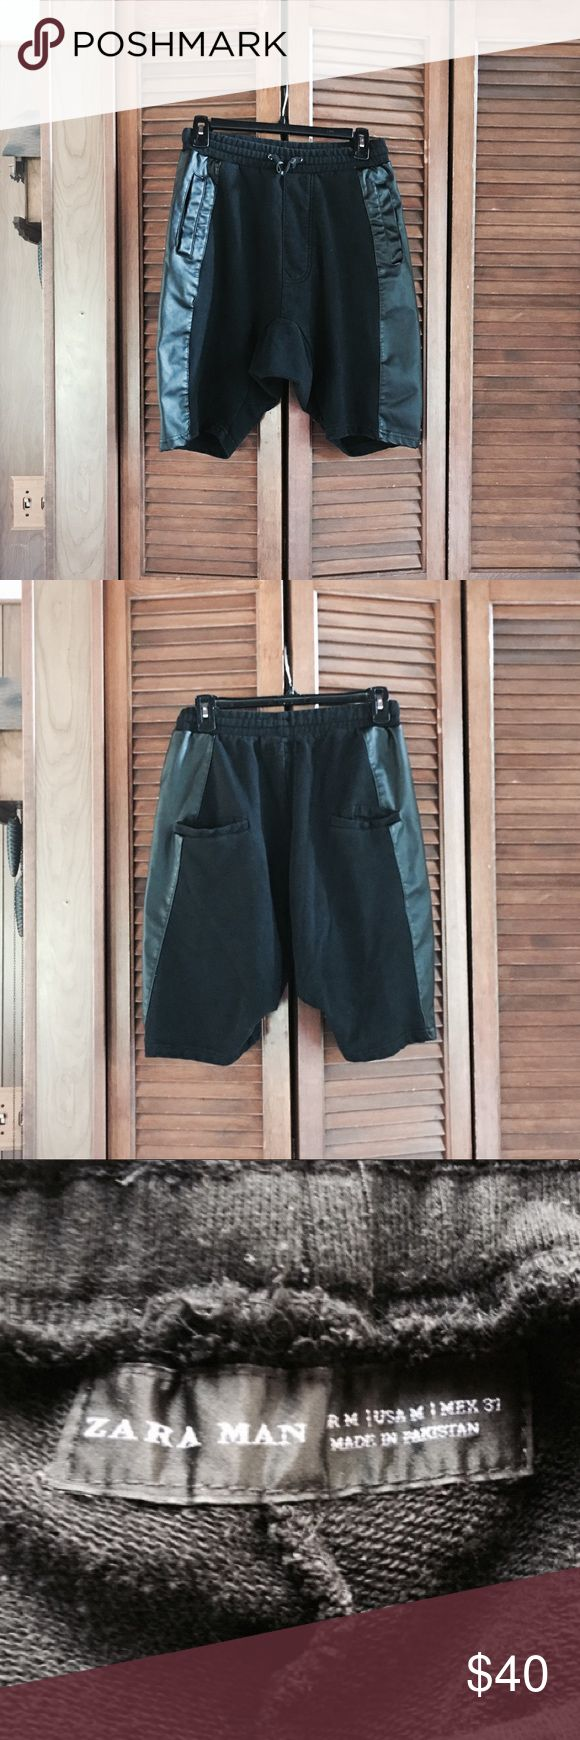 🎉SALE🎉Zara Drop-Shot Shorts Zara men's size M drop-shot black shorts with black leather side details. NWT. Rare item! Zara Shorts